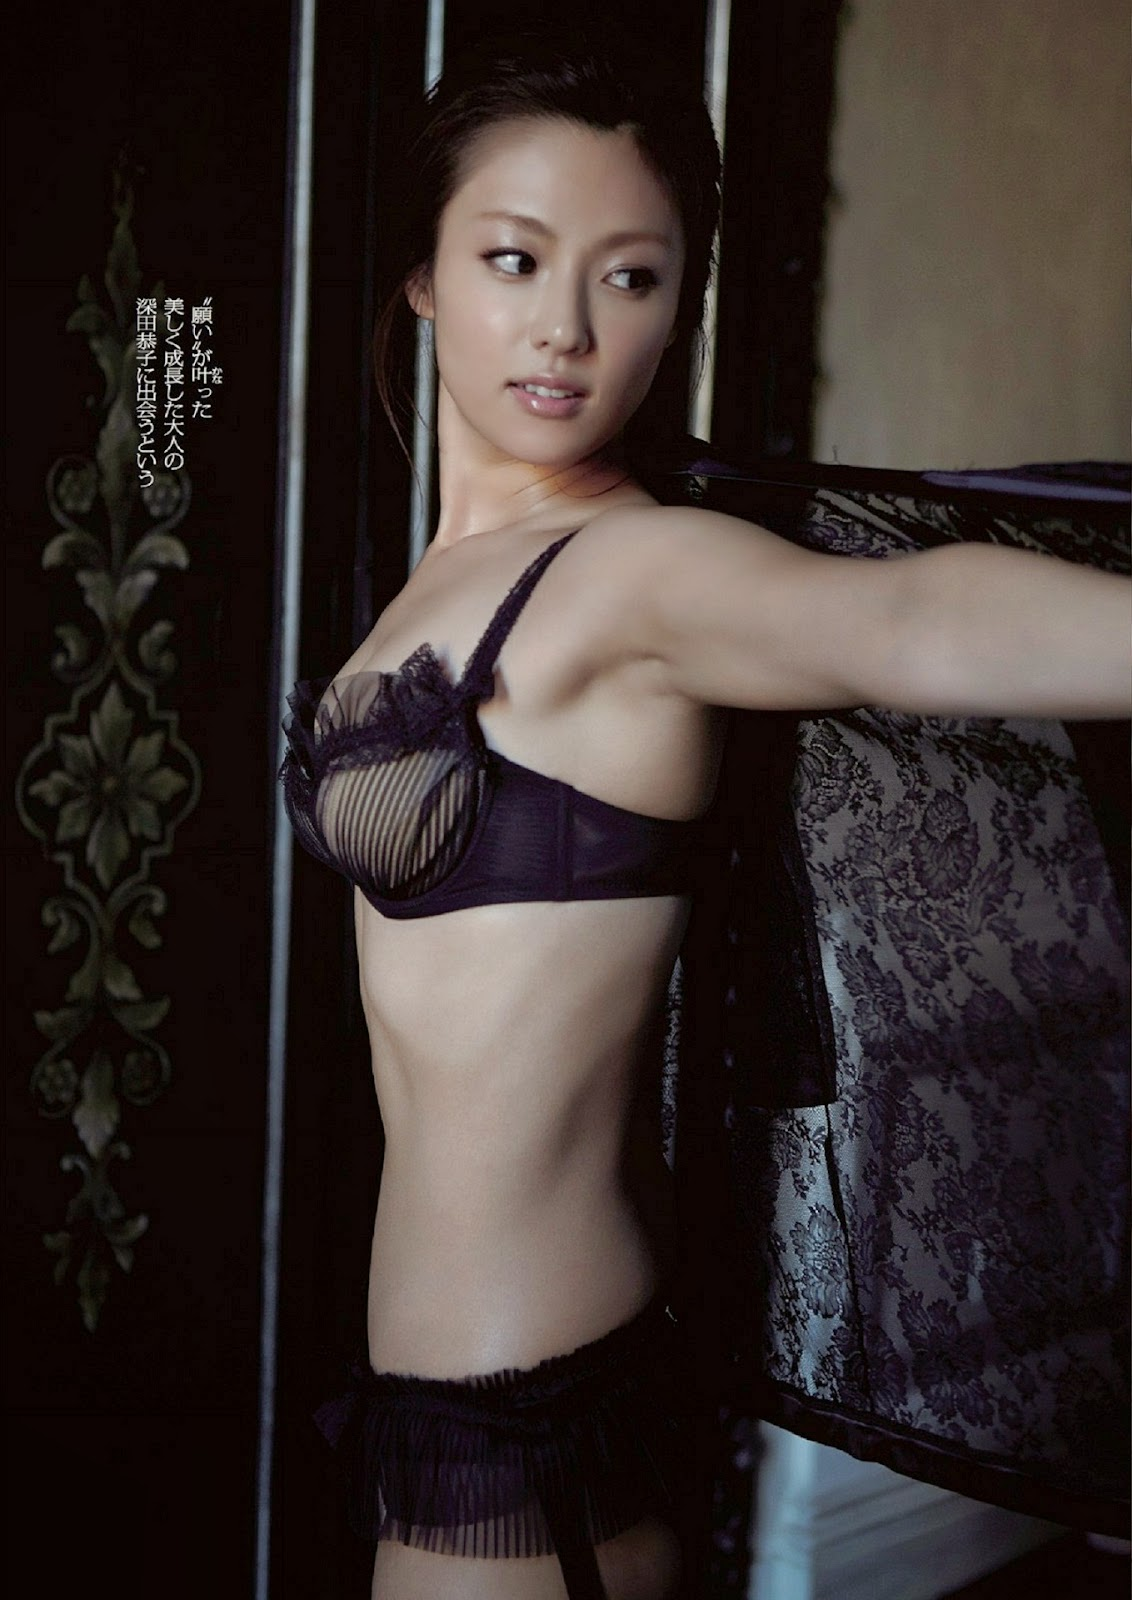 kyoko fukada nude fake kyouko fukada nude Kyoko Fukada 深田恭子 Weekly Playboy May 2014 Photos 3